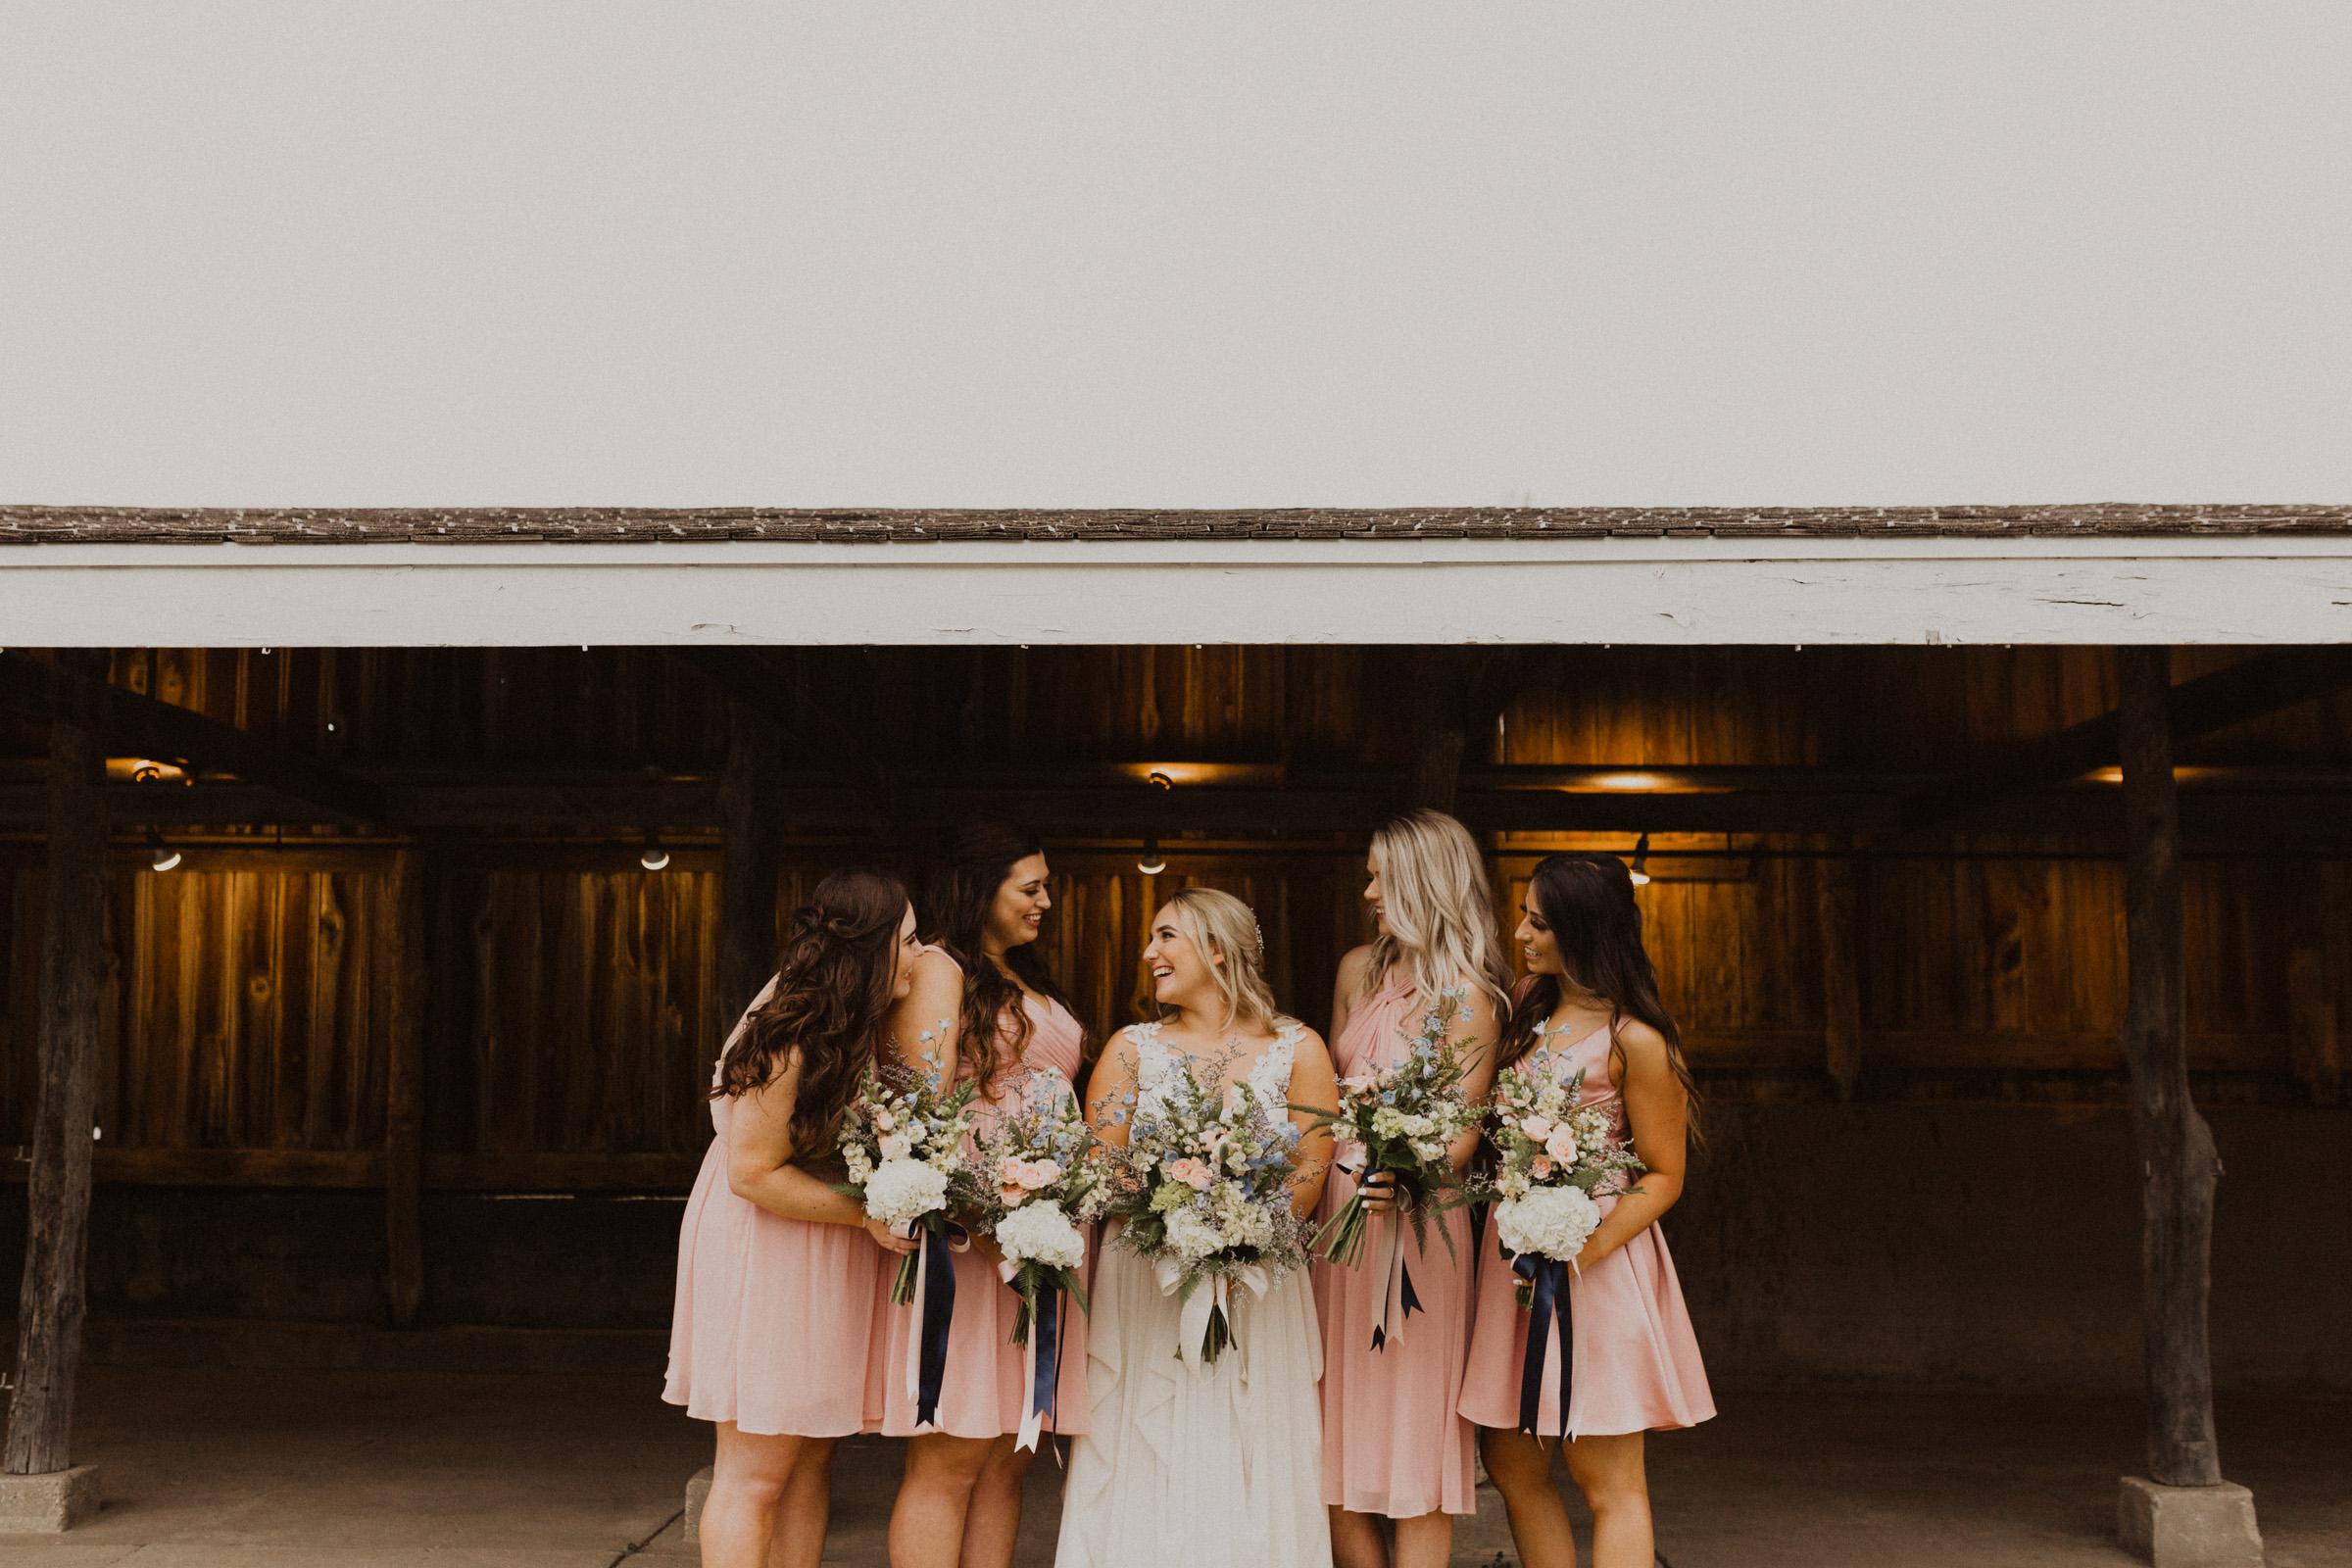 alyssa barletter photography nelson wedding nebraska city lied lodge morton barn spring wedding photographer-24.jpg